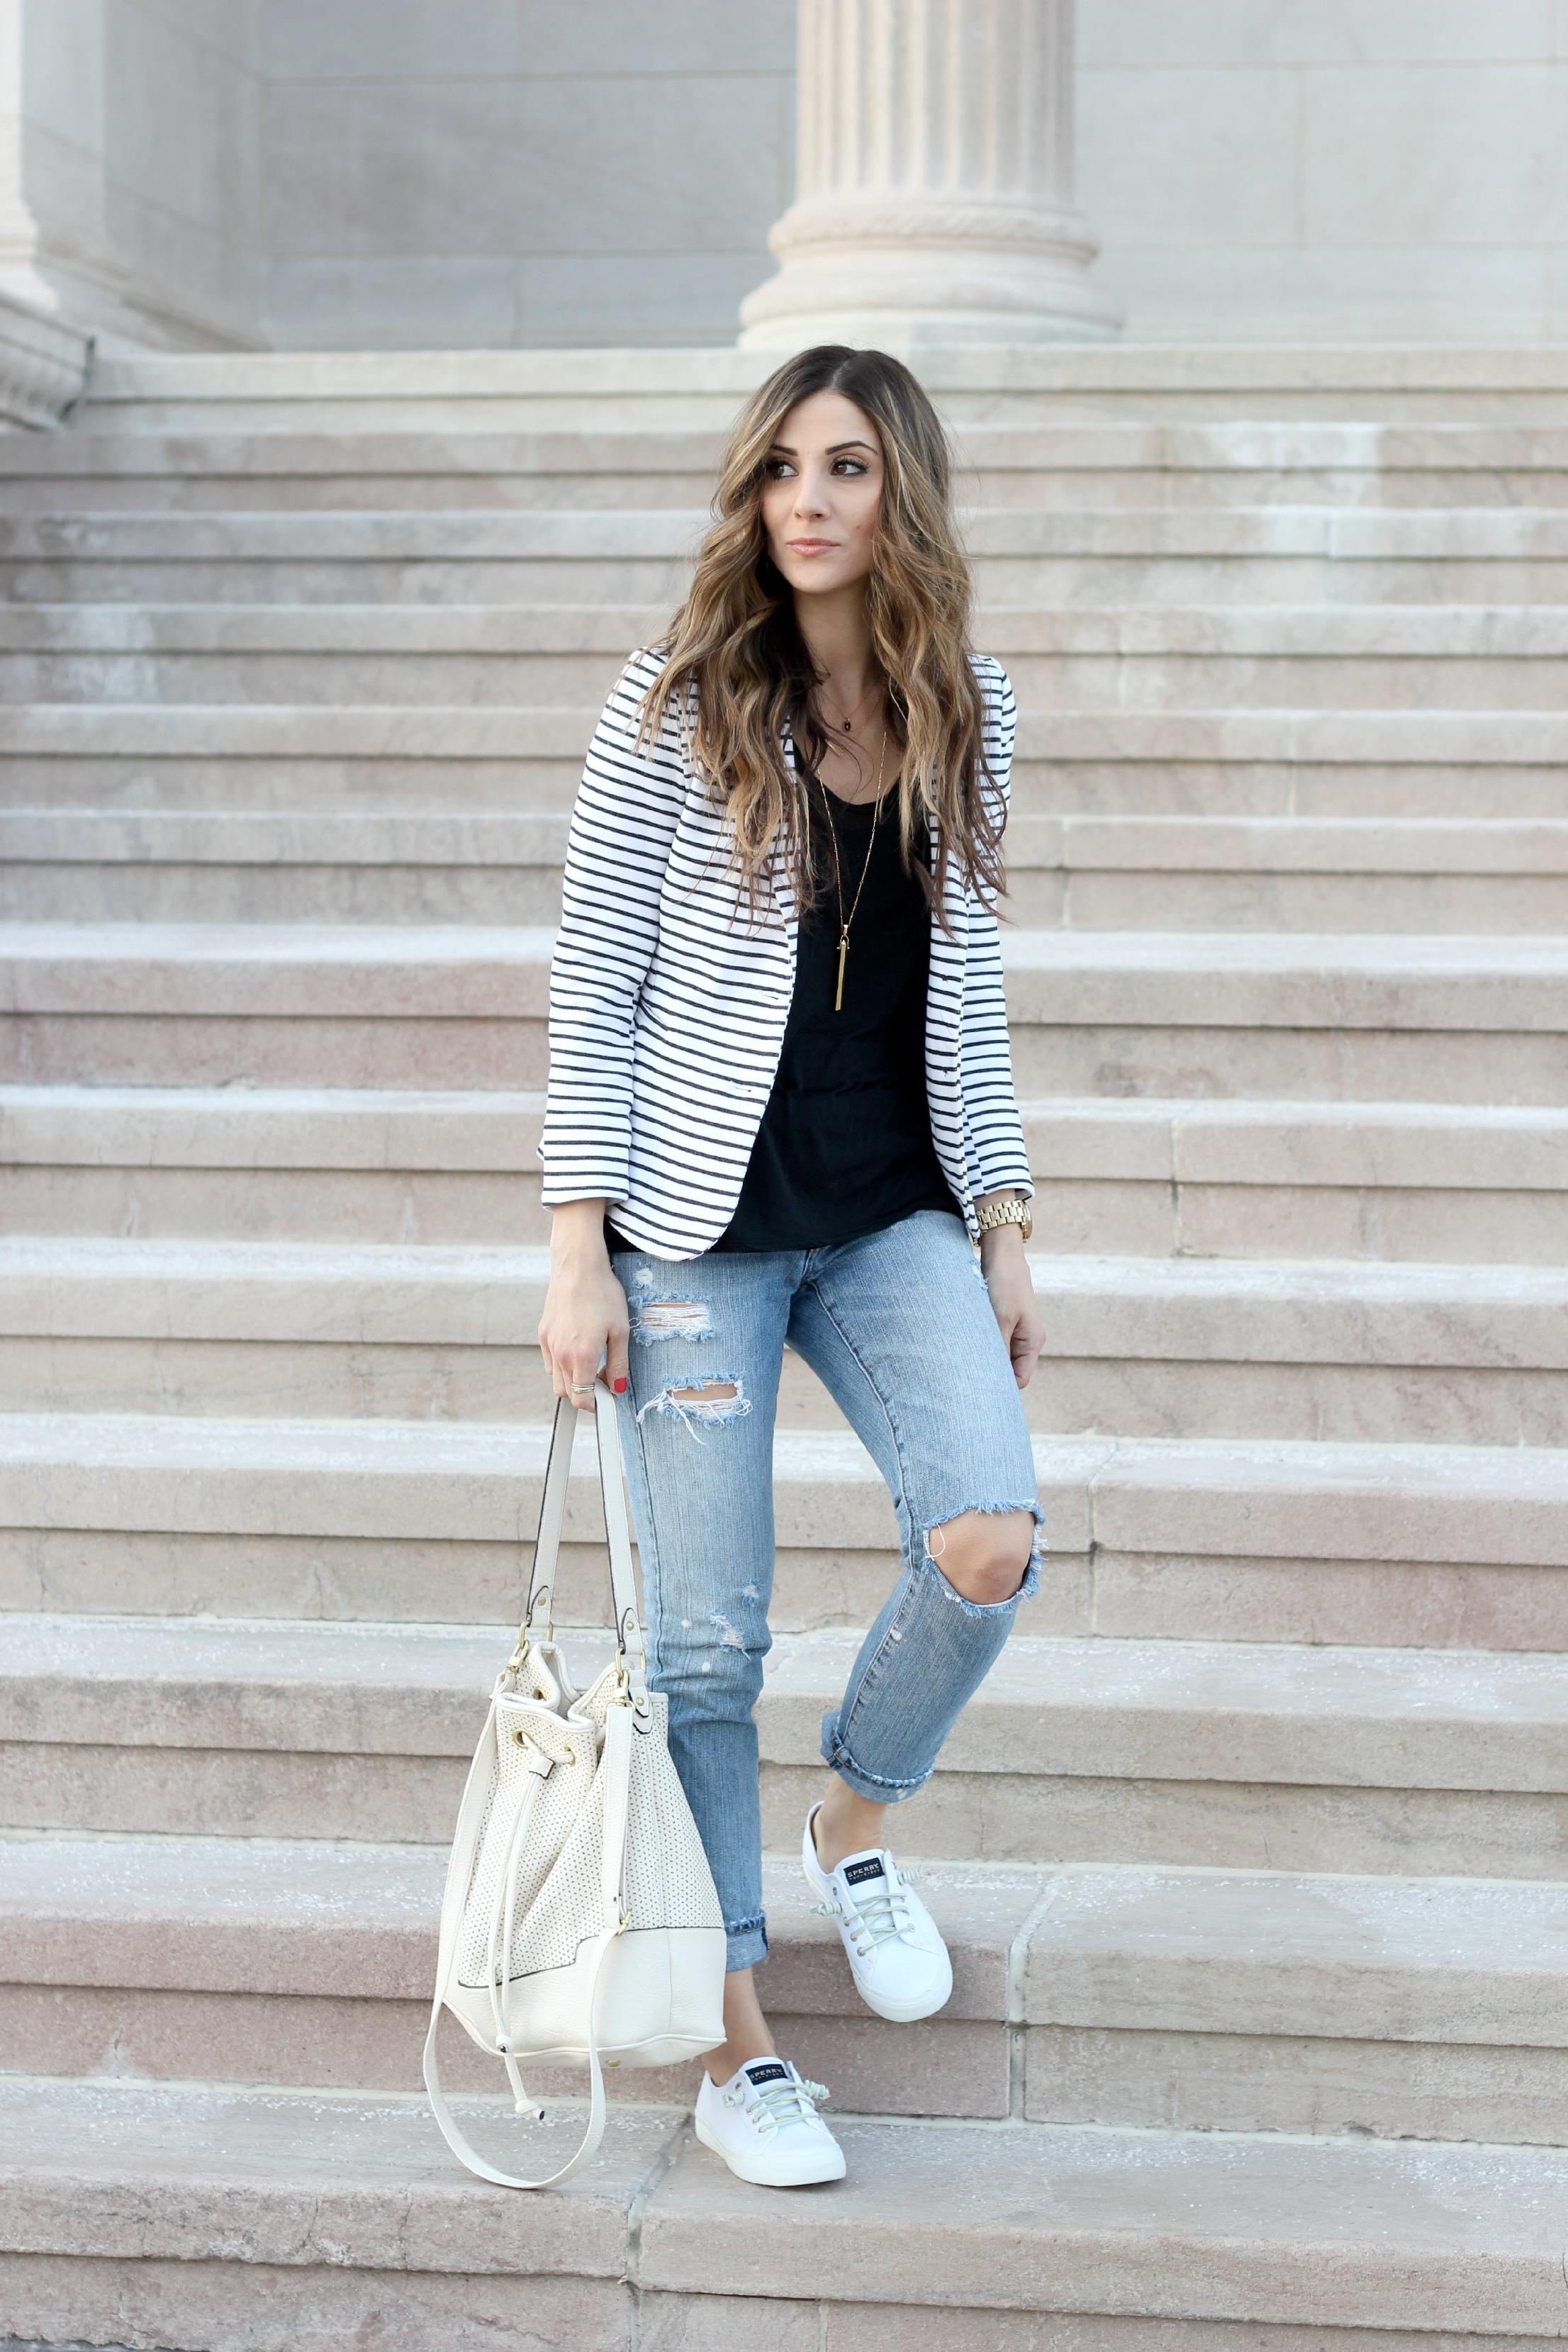 The Essential Spring Shoe - Lauren McBride